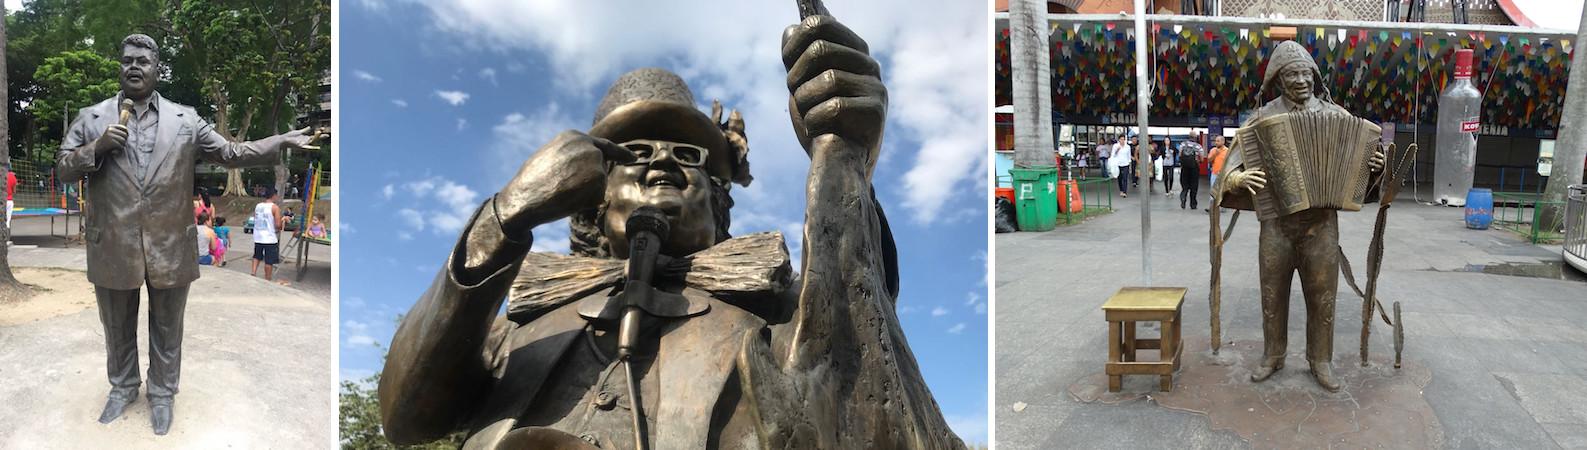 estatuas no rio 2